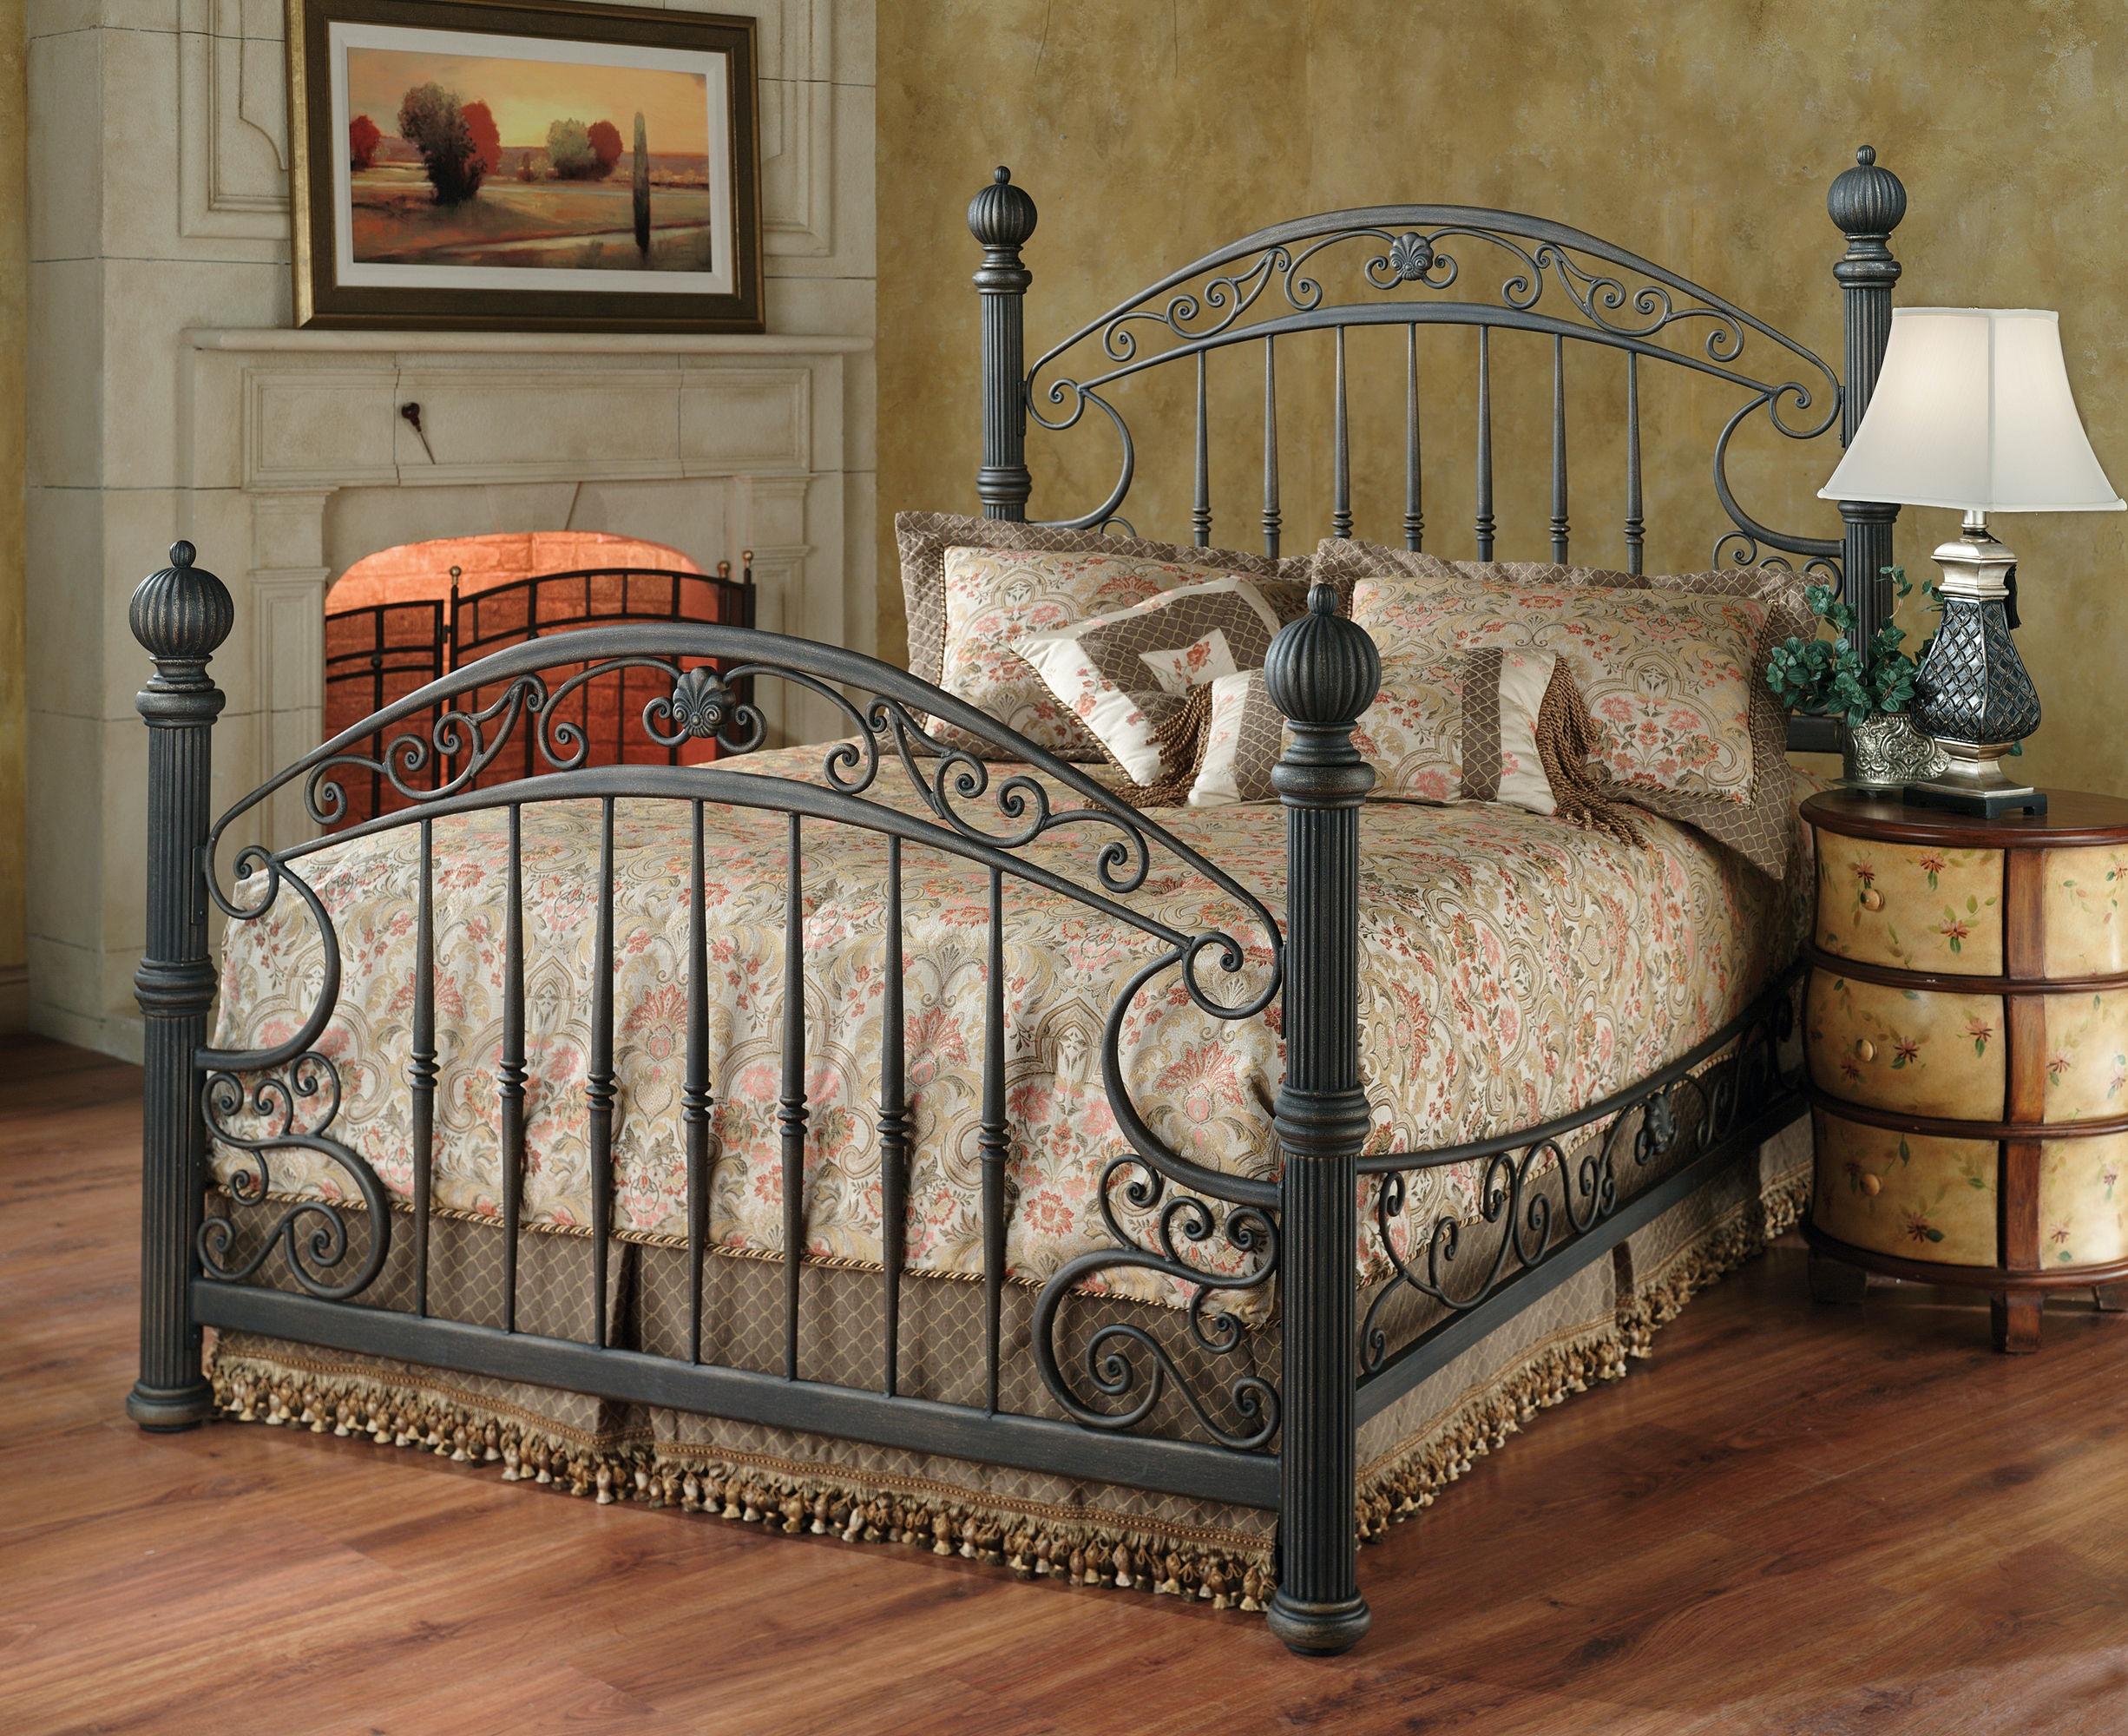 Exceptionnel Hillsdale Furniture Bedroom Chesapeake Headboard Grill   King 1335 670 At  EMW Carpets U0026 Furniture